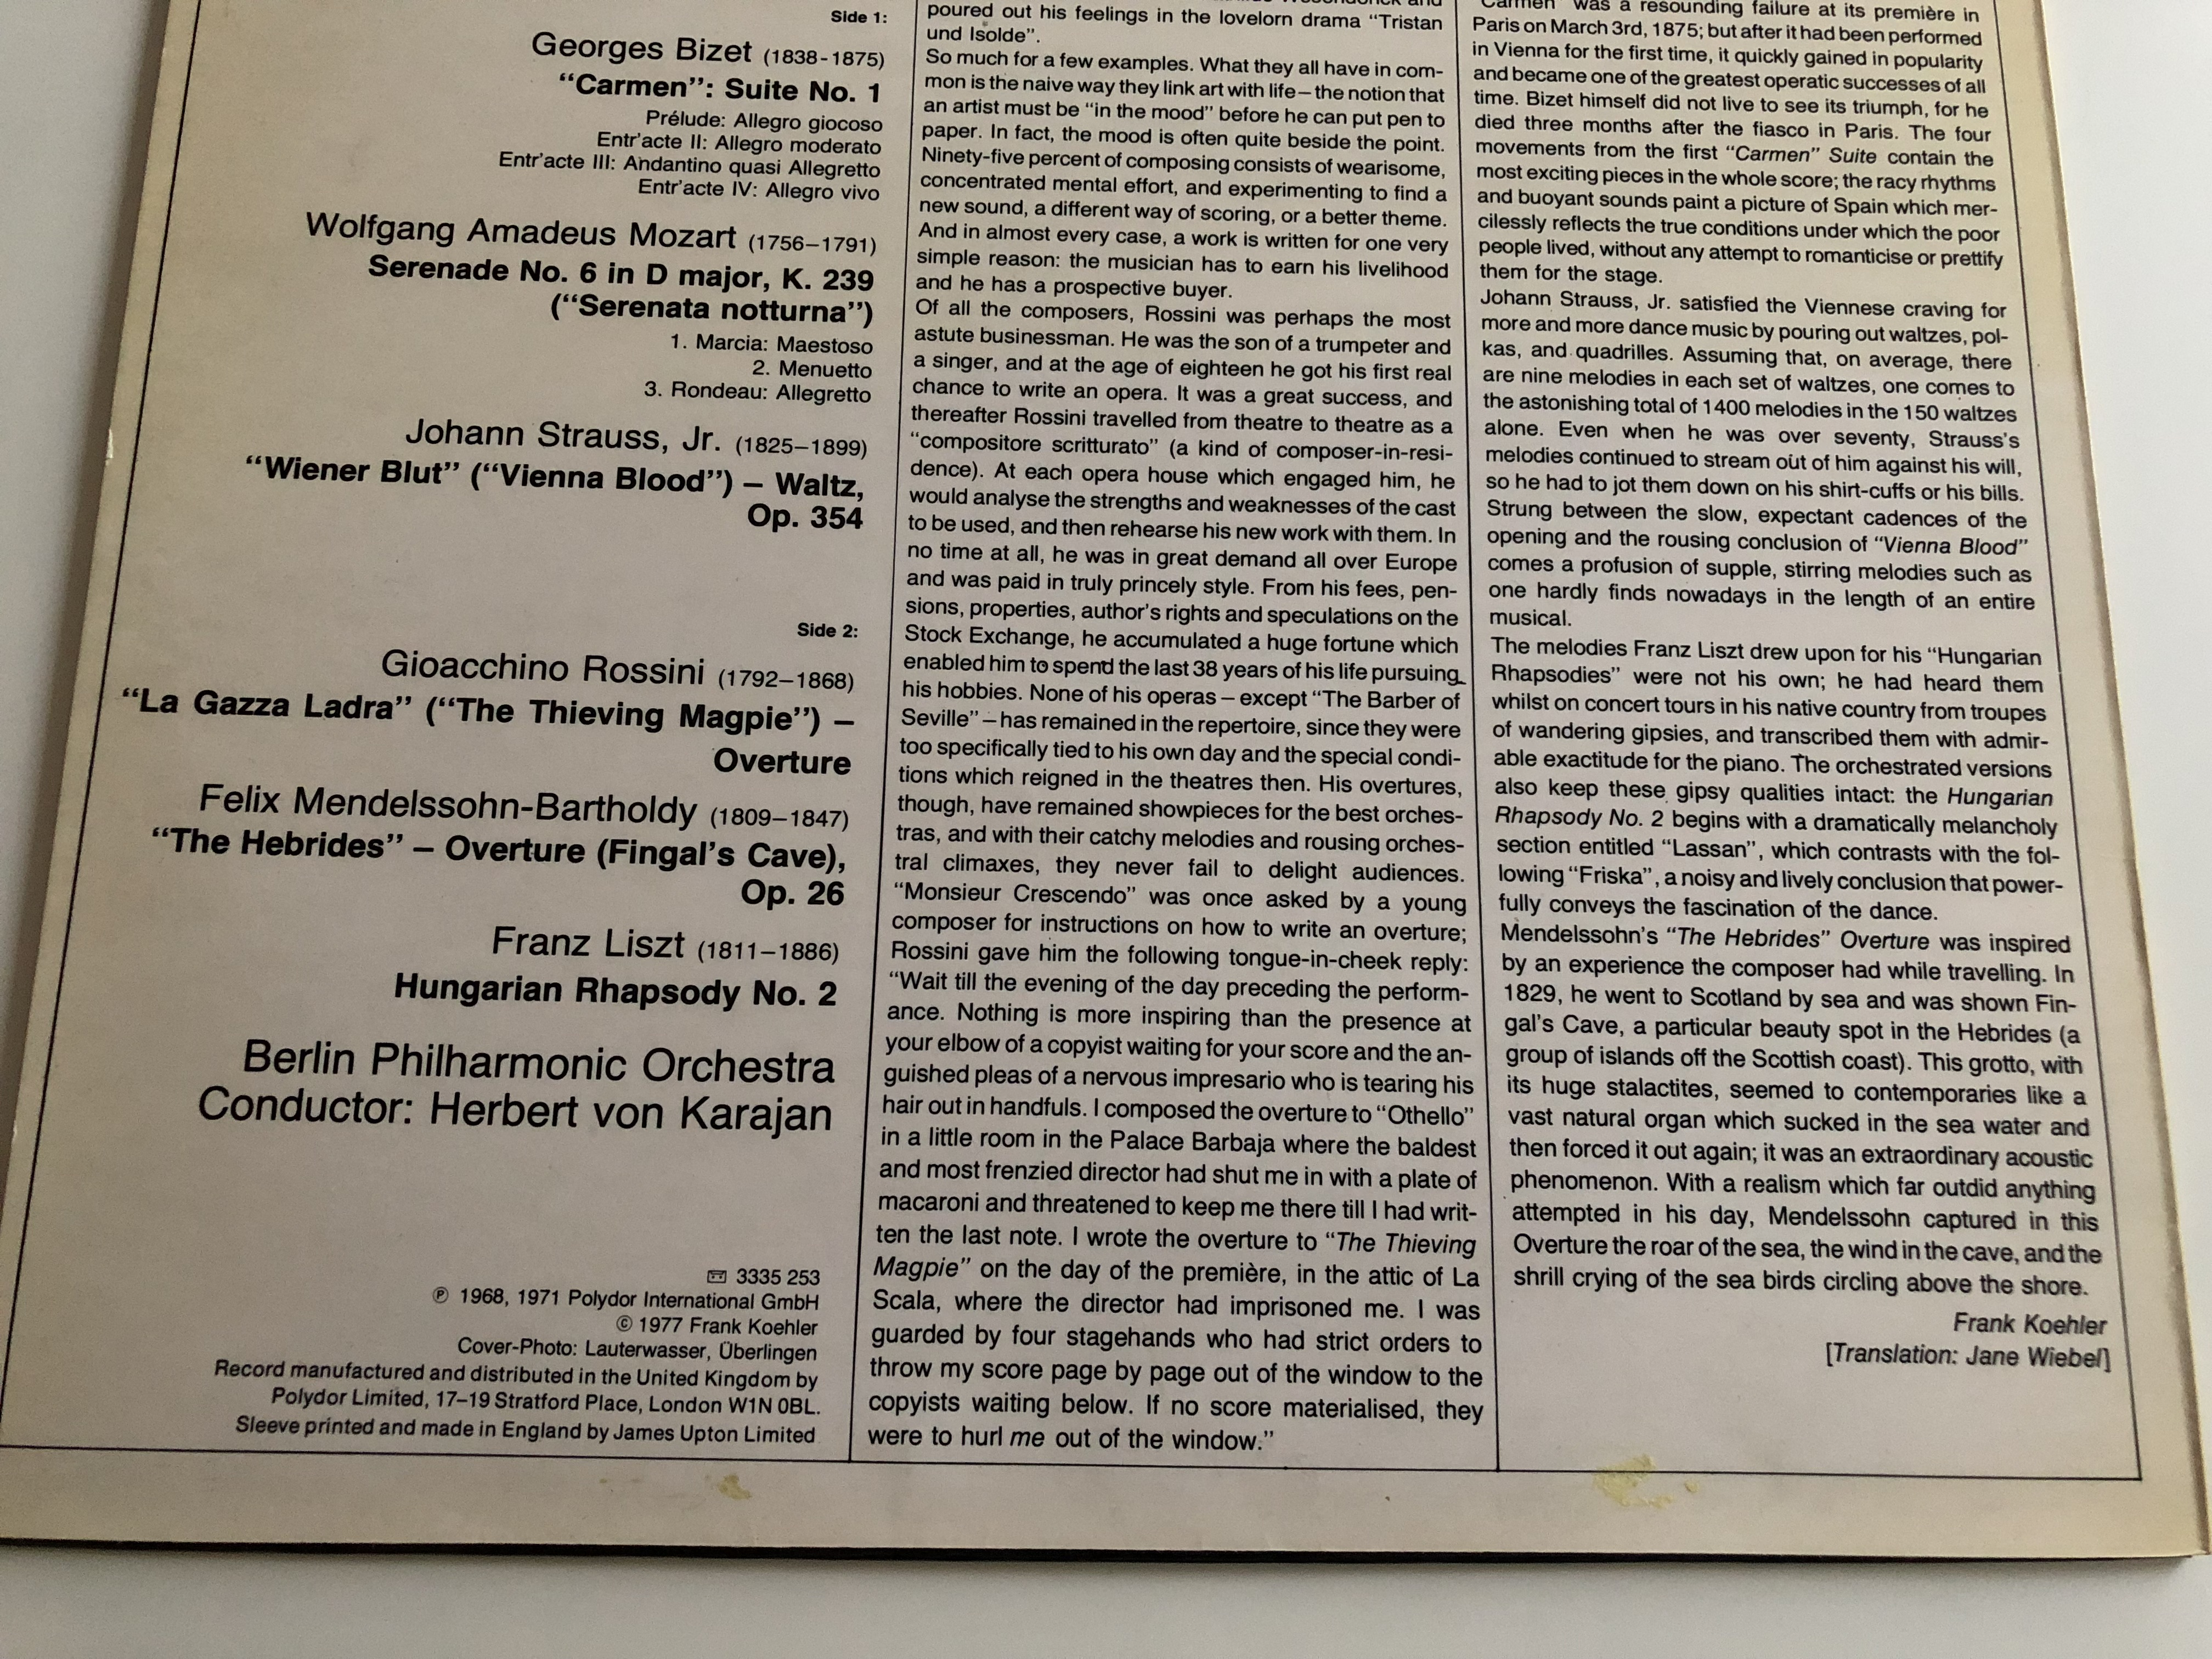 hifi-karajan-berlin-philharmonic-conducted-herbert-von-karajan-bizet-mozart-strauss-rossini-mendelssohn-liszt-deutsche-grammophon-lp-stereo-2535-253-5-.jpg